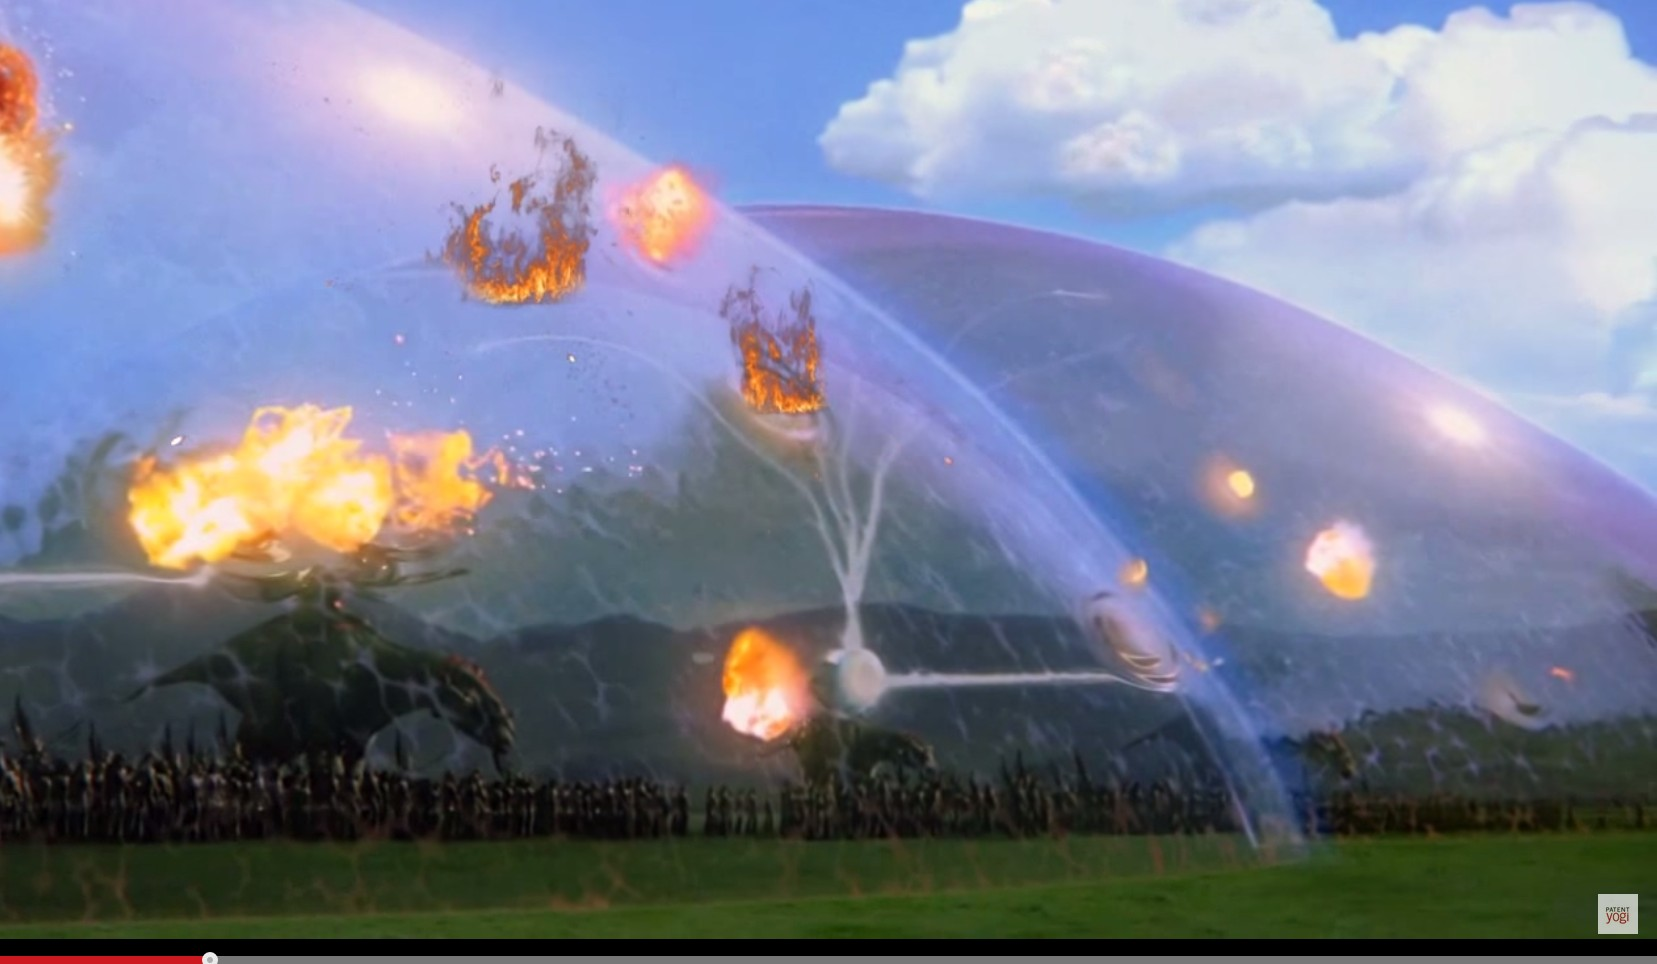 Boing Patent: Neue Kraftfeld-Technologie bietet Explosionsschutz